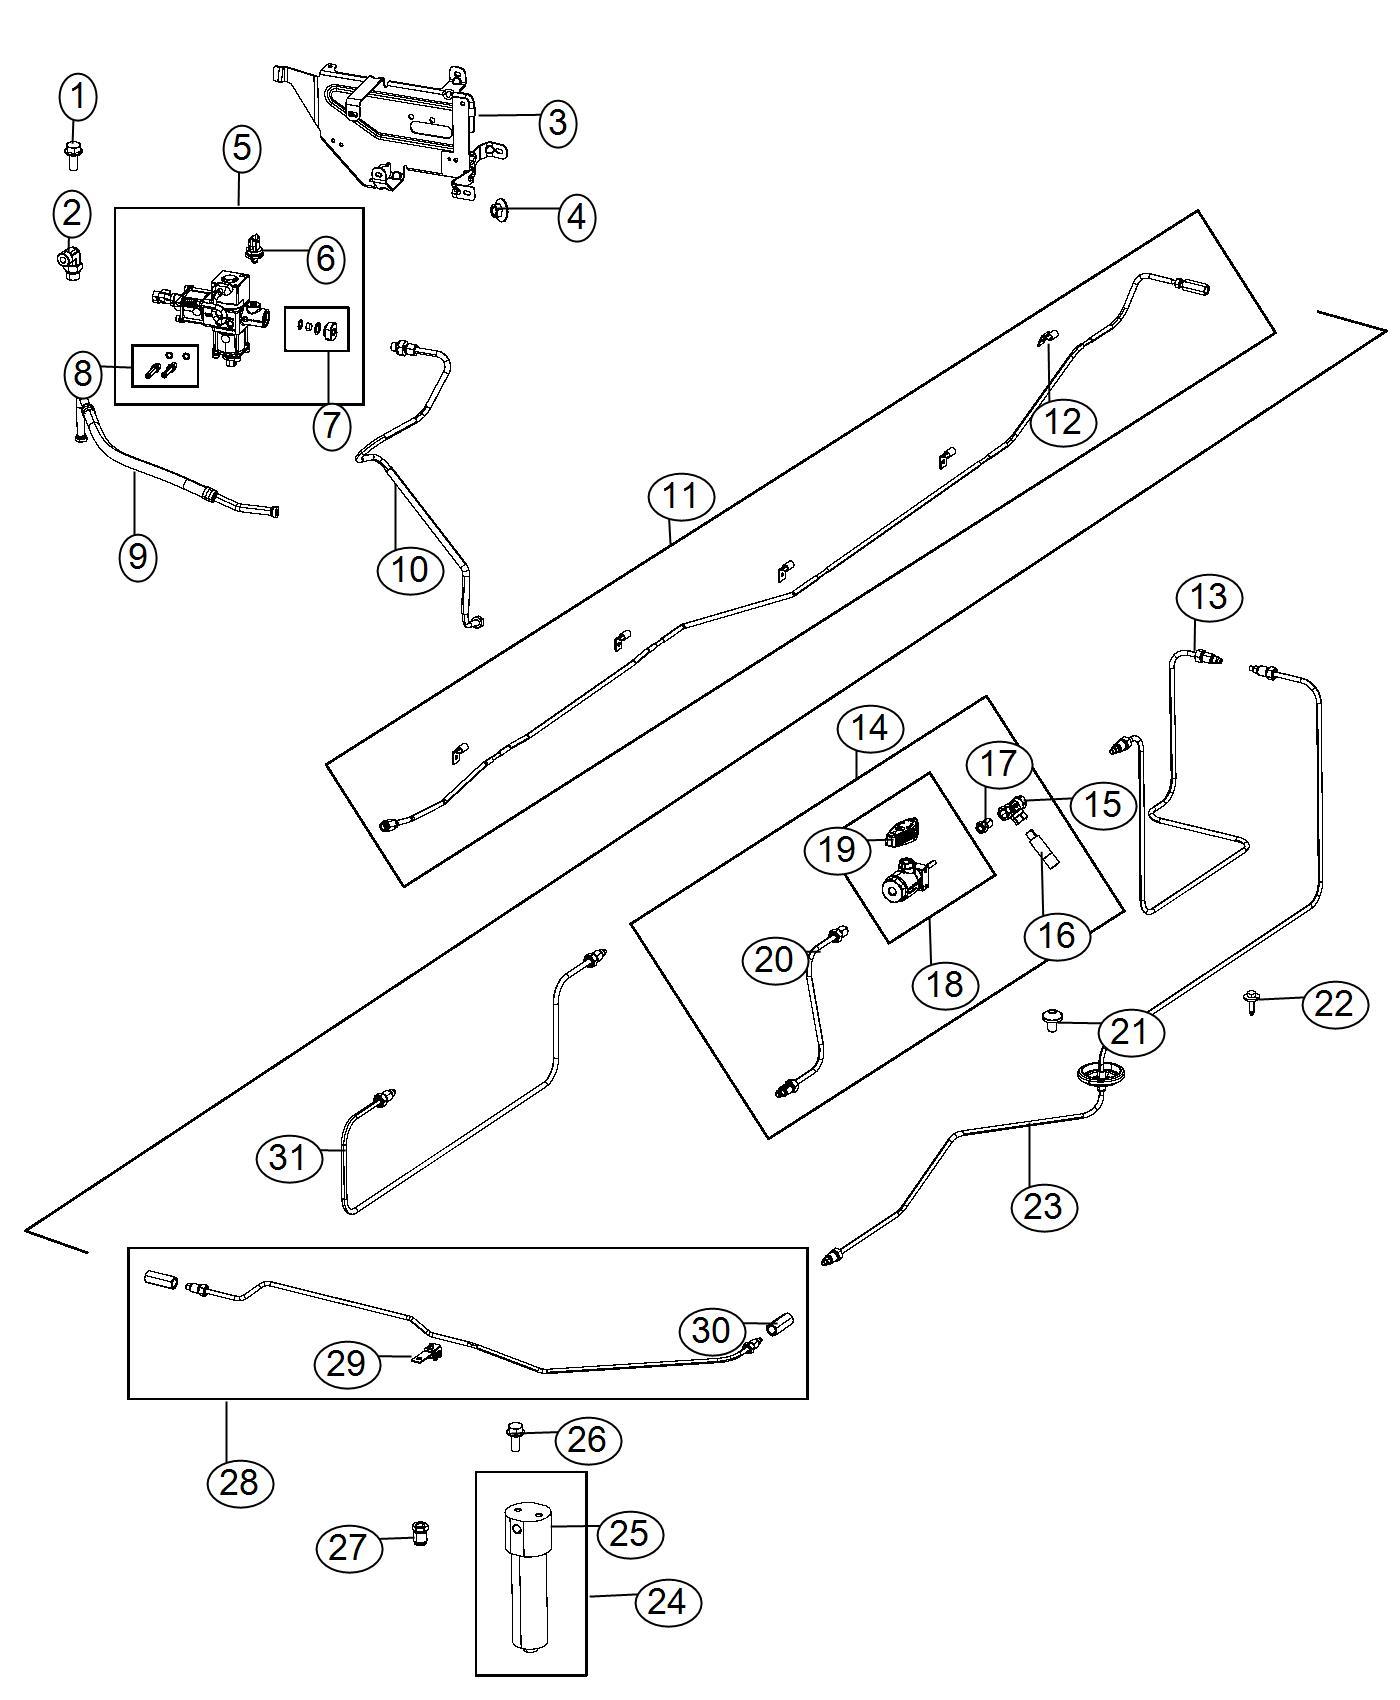 Ram 2500 Bracket. Pressure regulator. Fuel, cng, lines